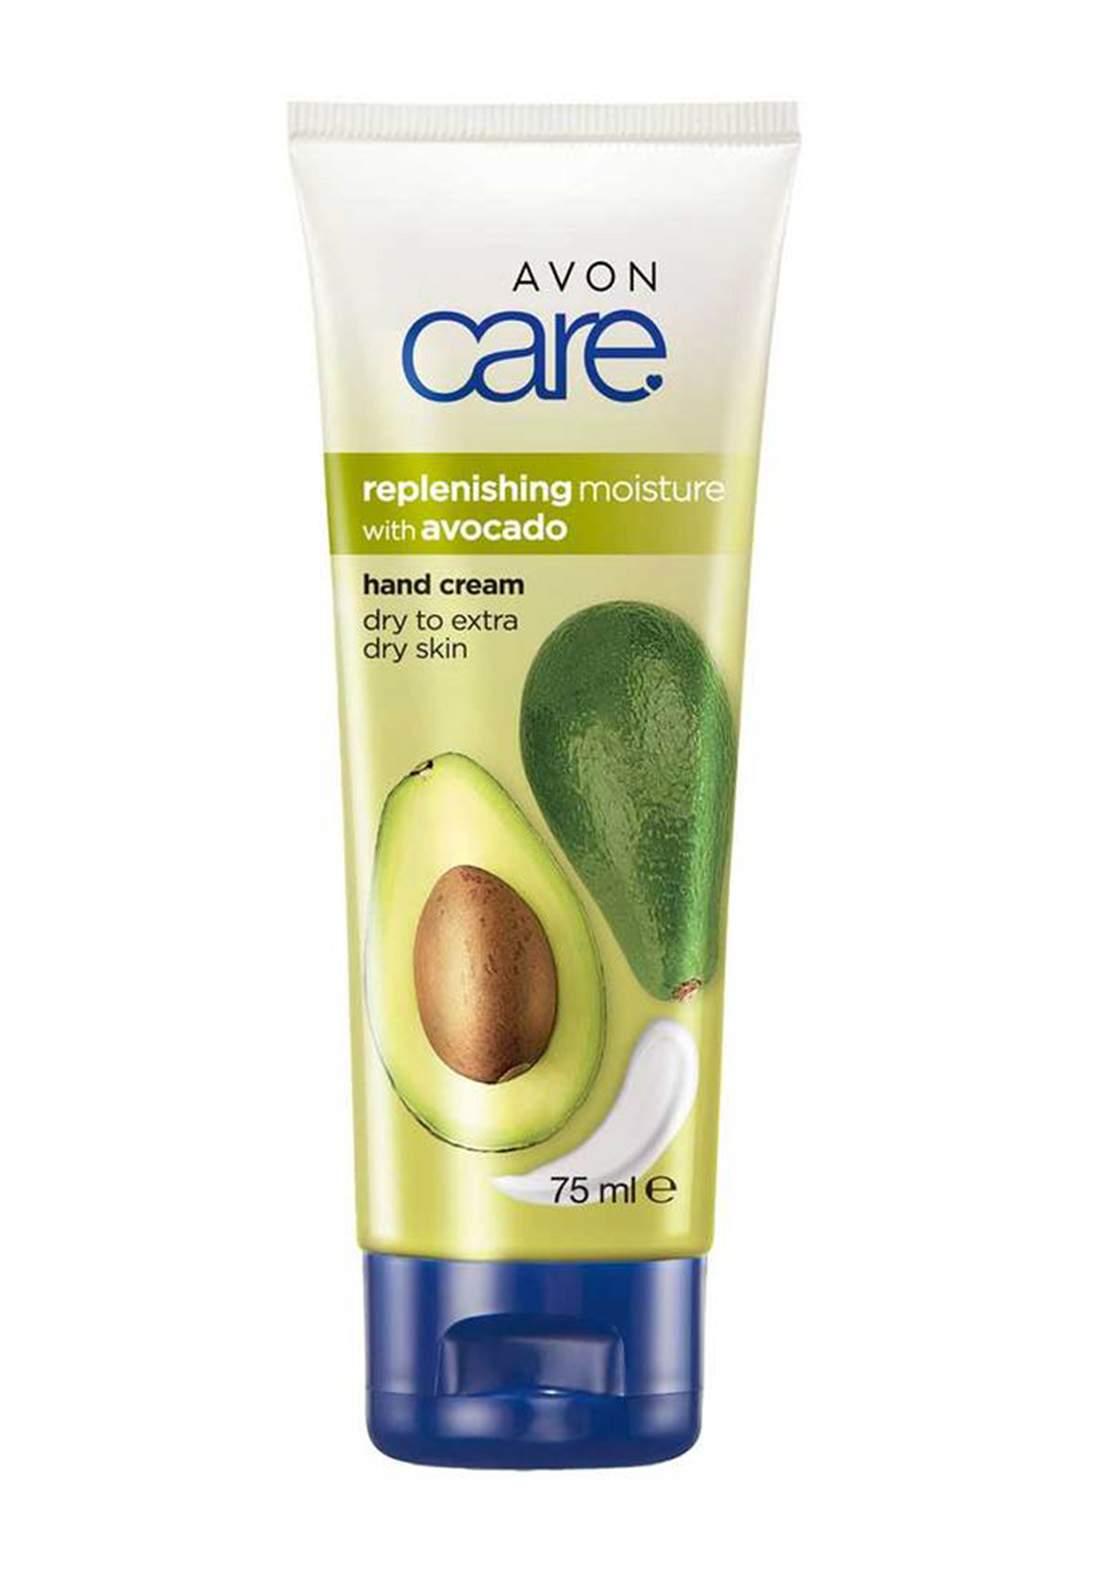 Avon 5940500 Care Replenishing Moisture Hand Cream with Avocado Oil Vitamin E - 75ml كريم لليدين